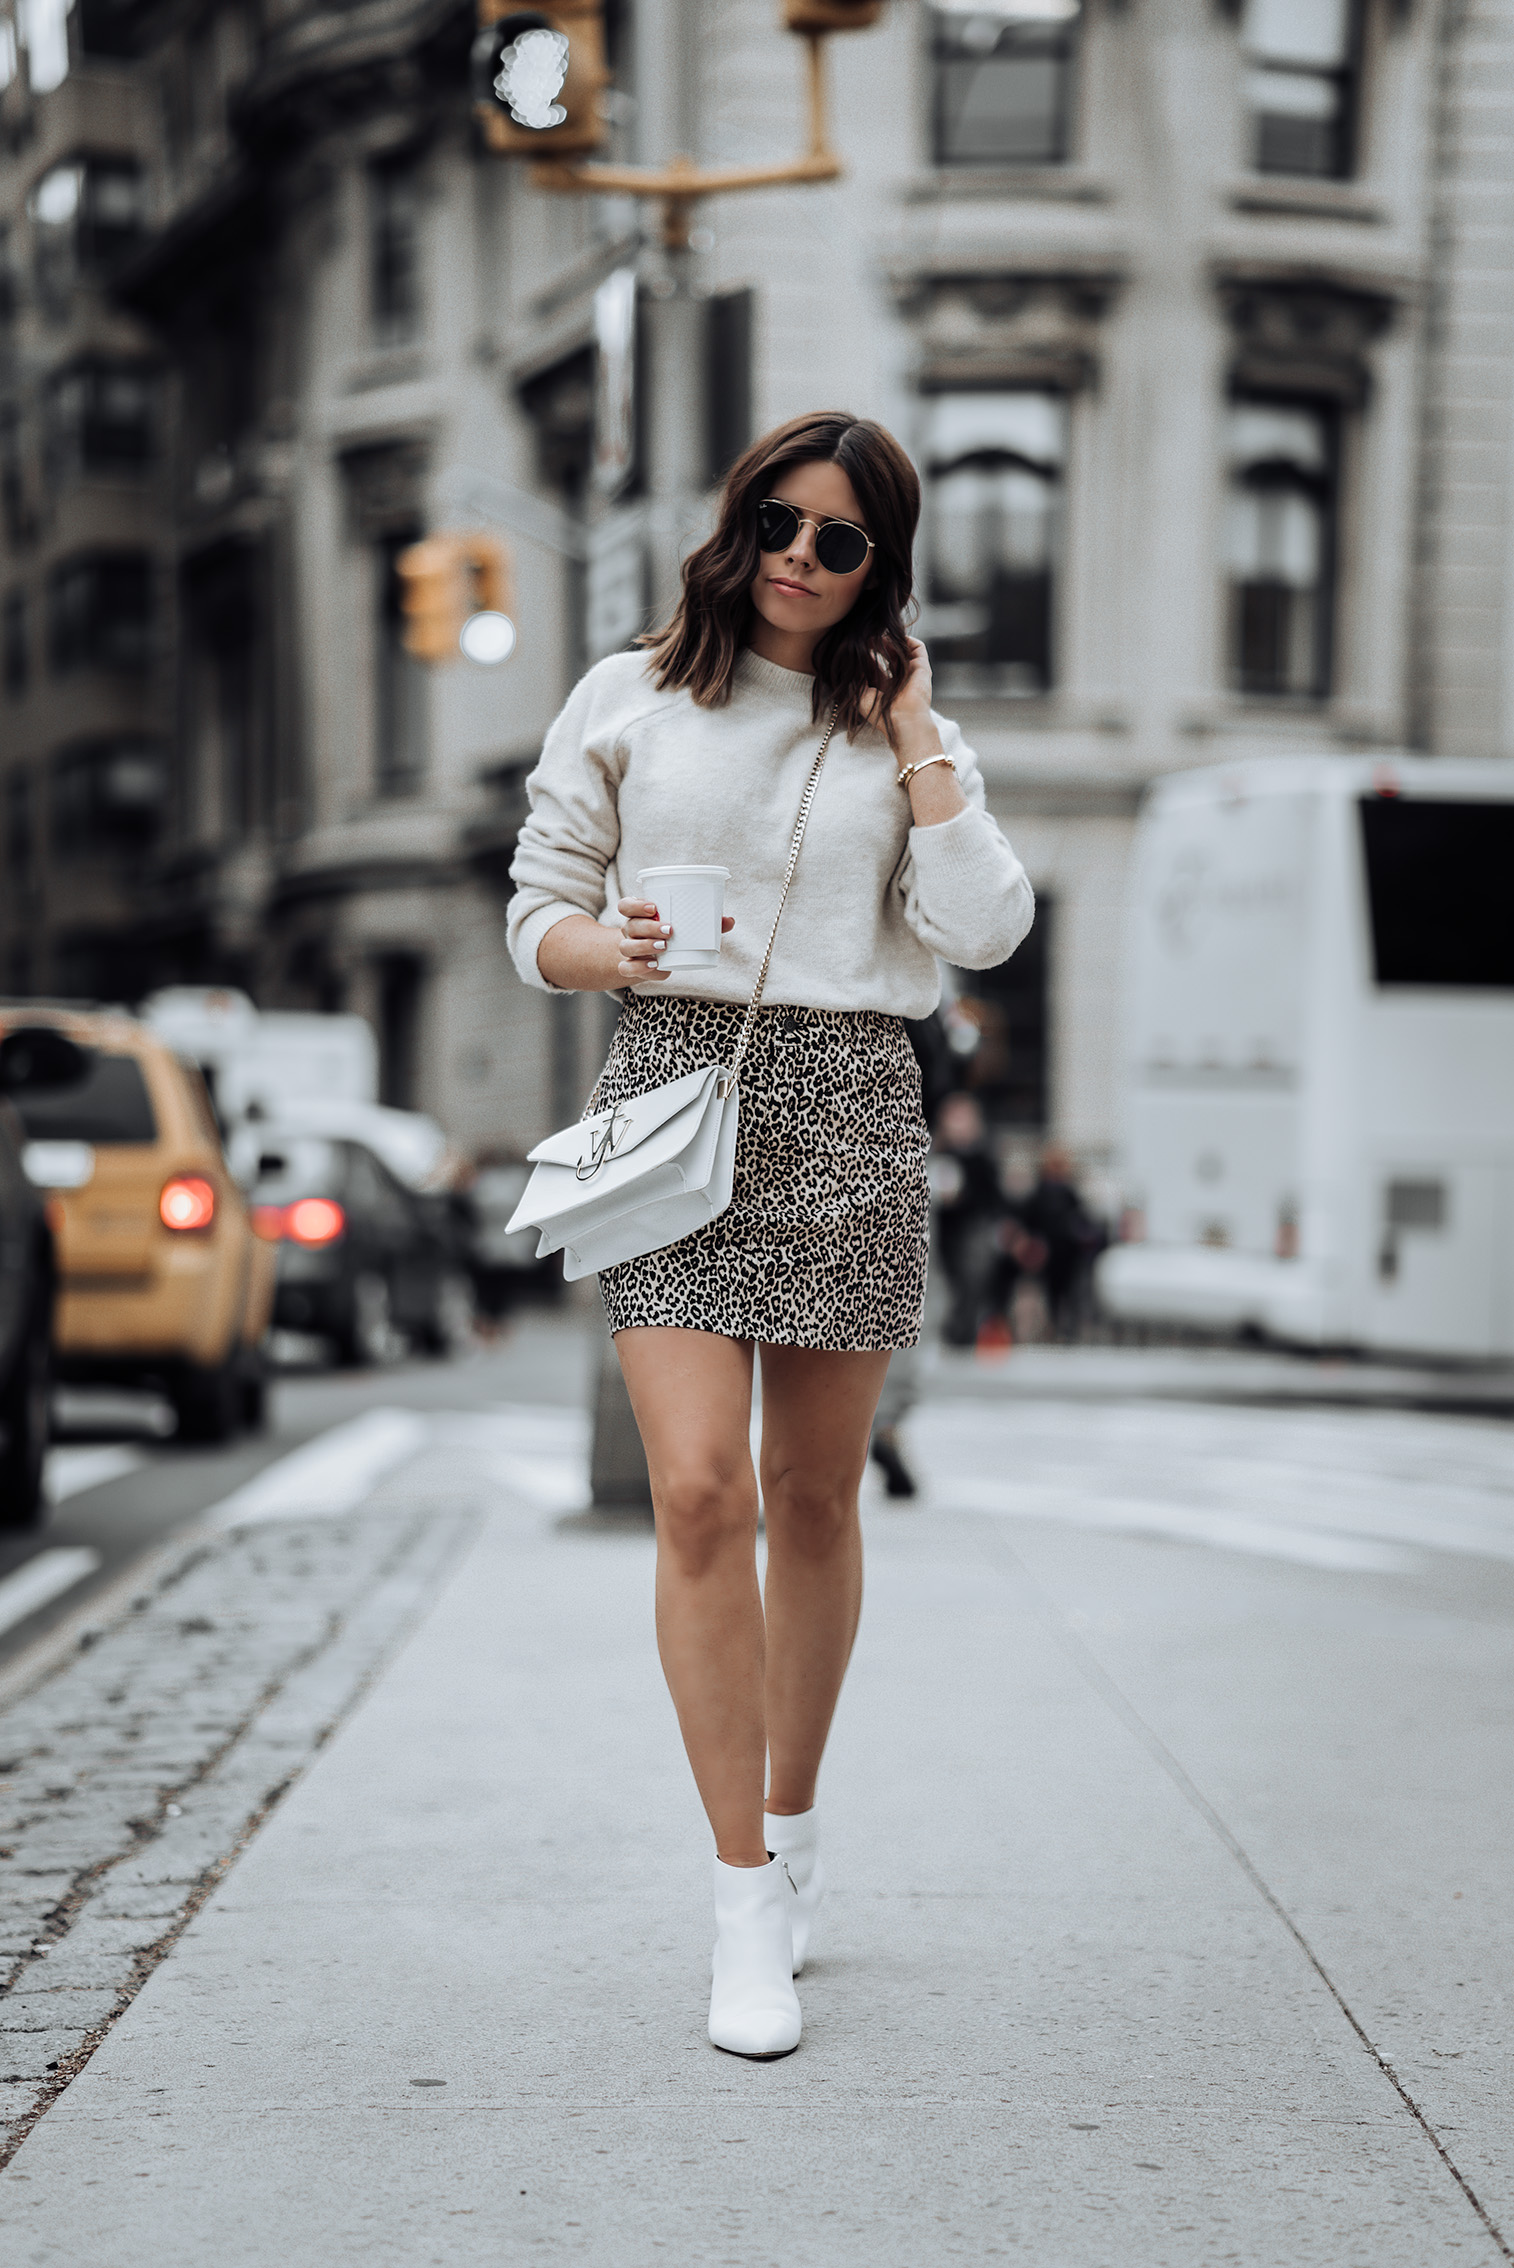 Revolve Leopard Mini Skirt | Sand color Sweater | J.W. Anderson Logo Purse | Similar white Ankle Boots here | #liketkit #ootd #style #blog #leopardskirt #streetstyle